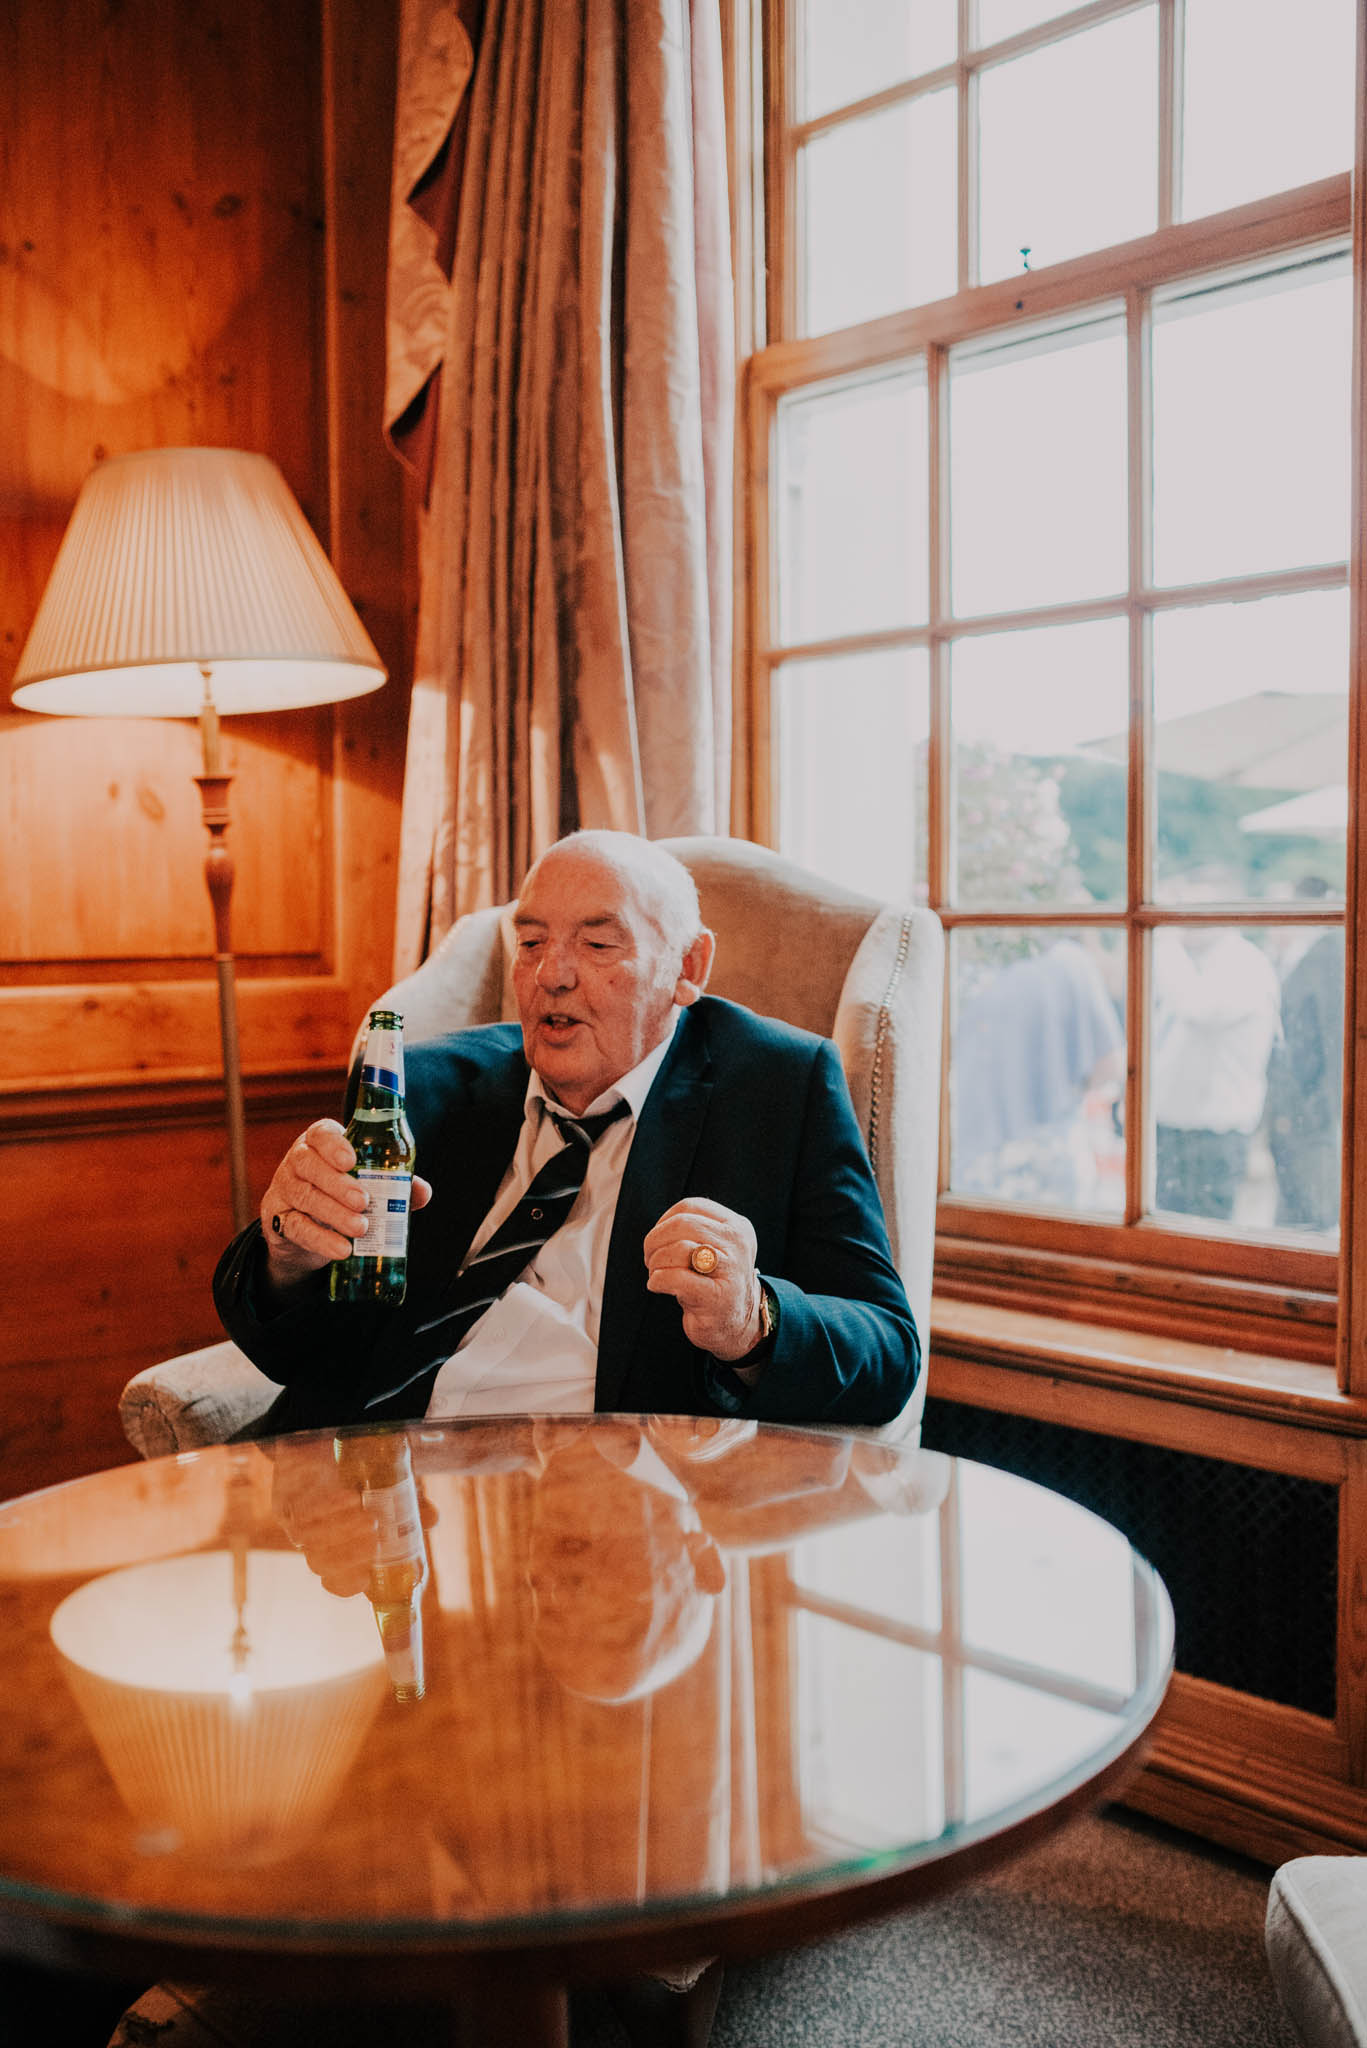 Drink-wedding-blog-scott-stockwell-photography-end-2017.jpg